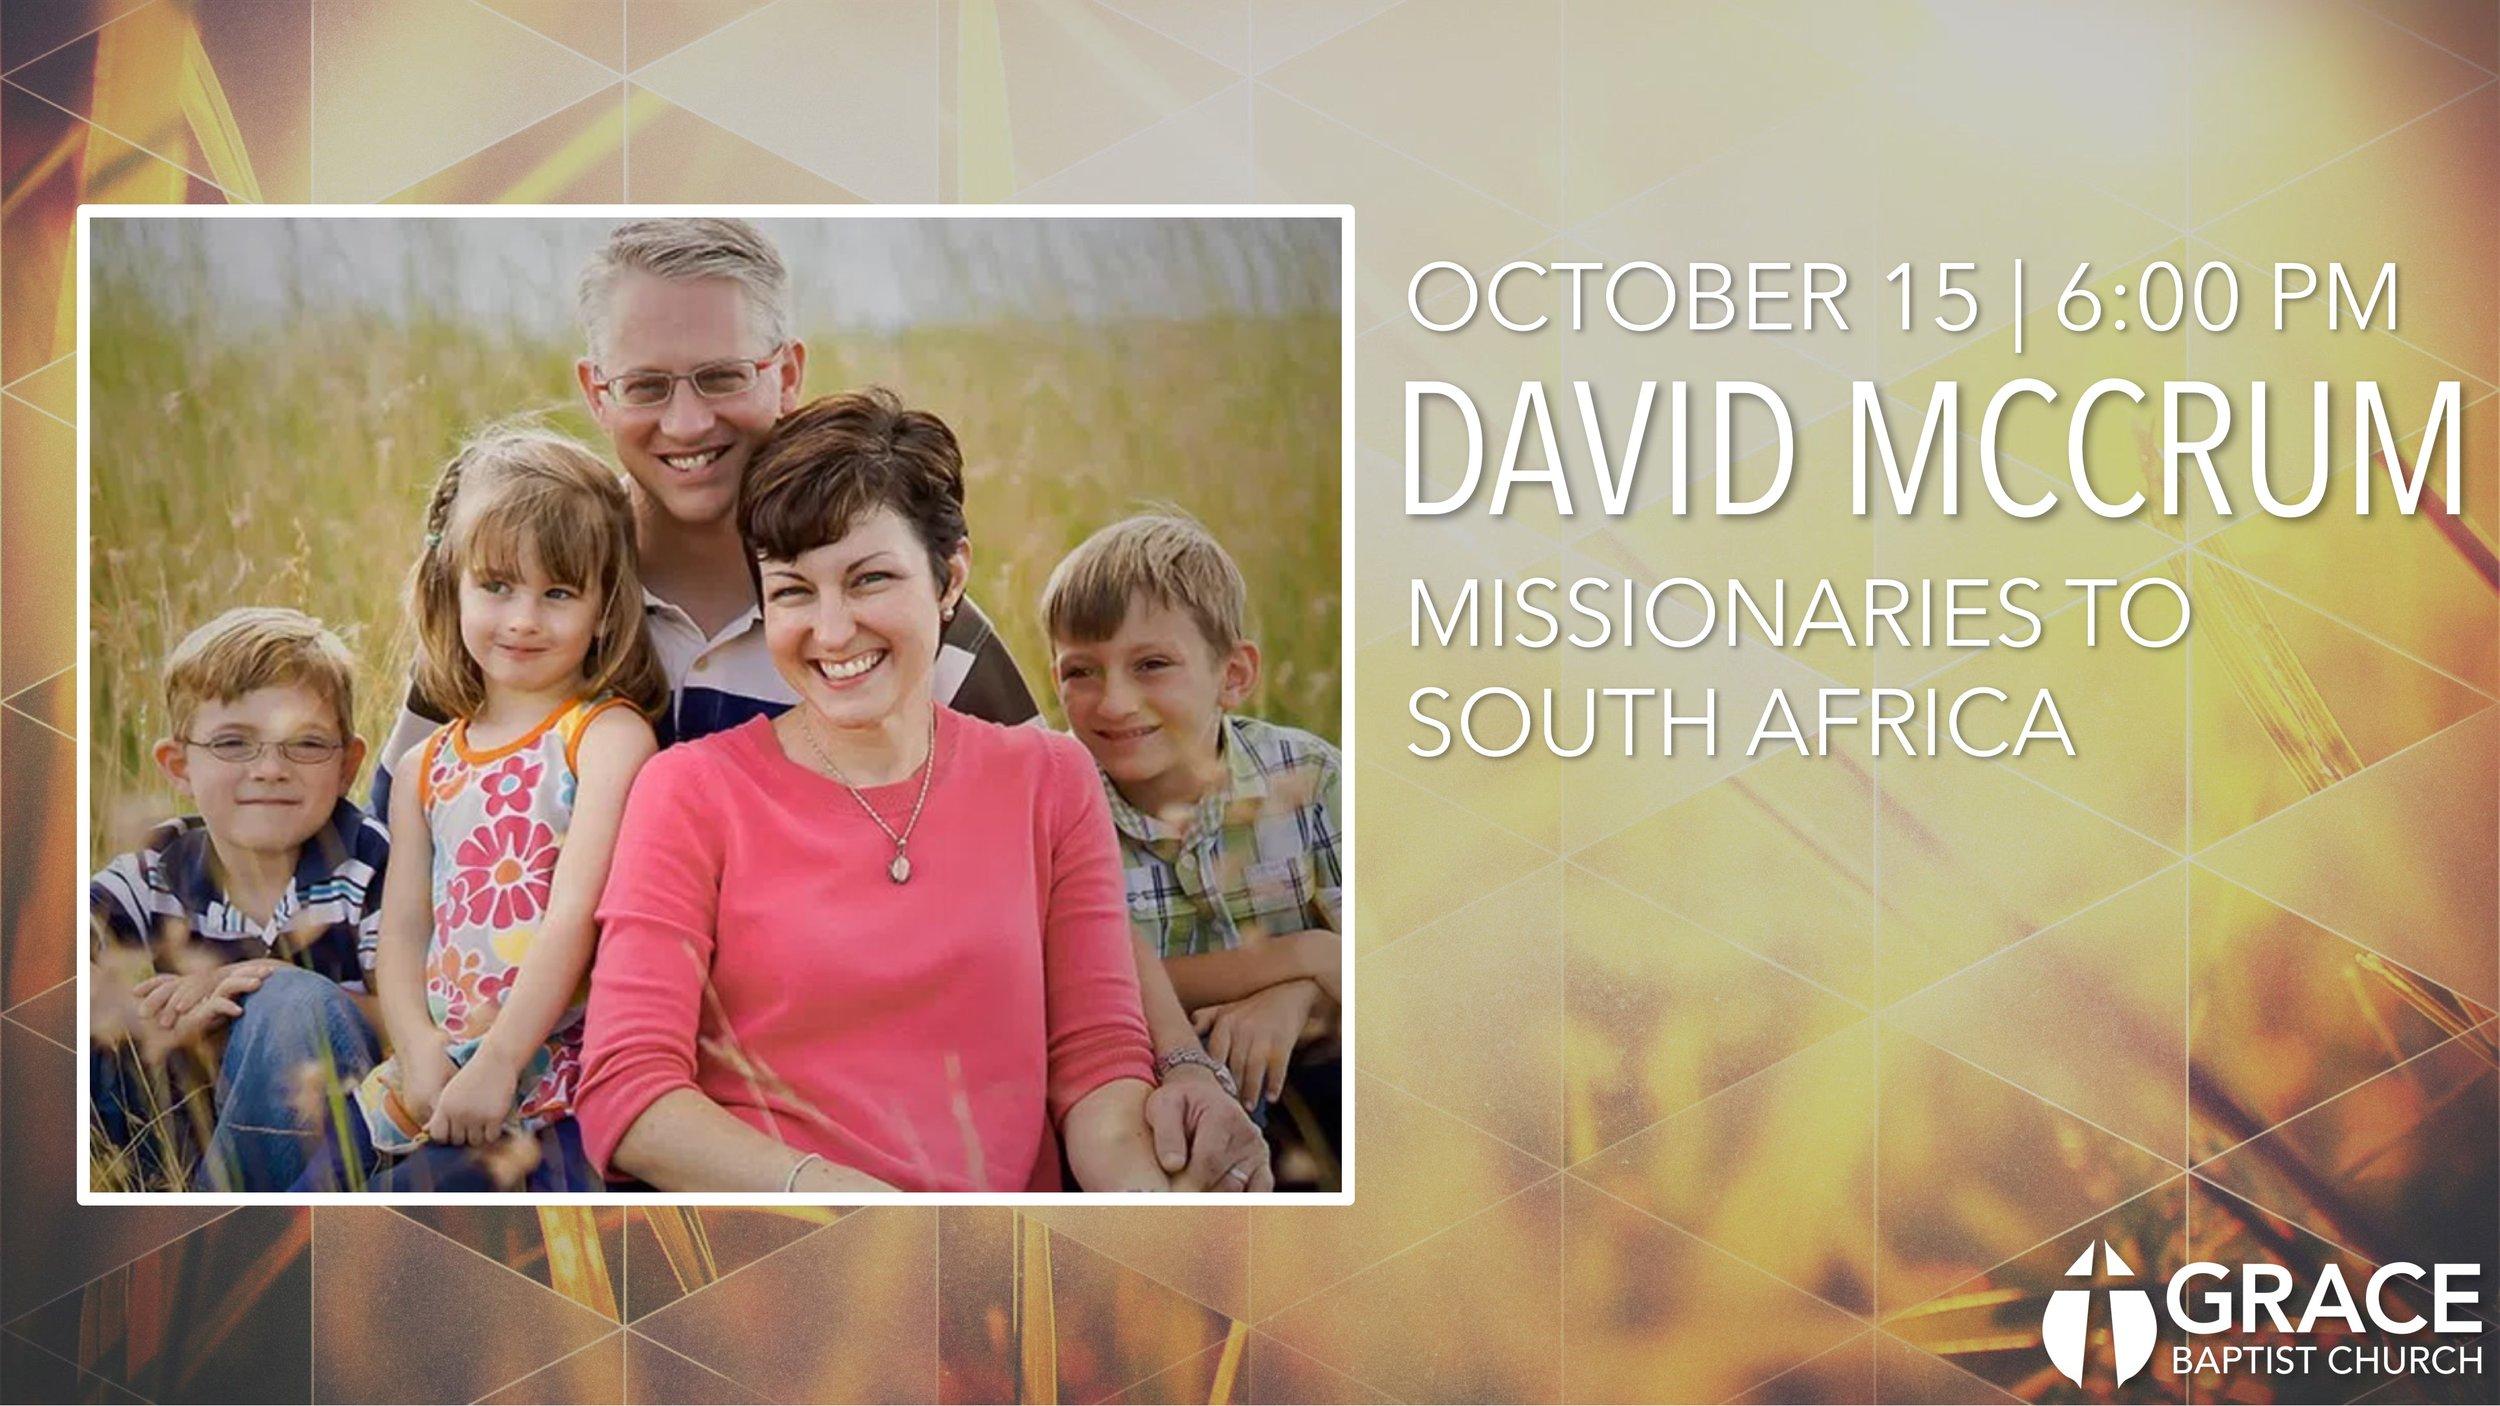 Missionary David McCrum.jpg